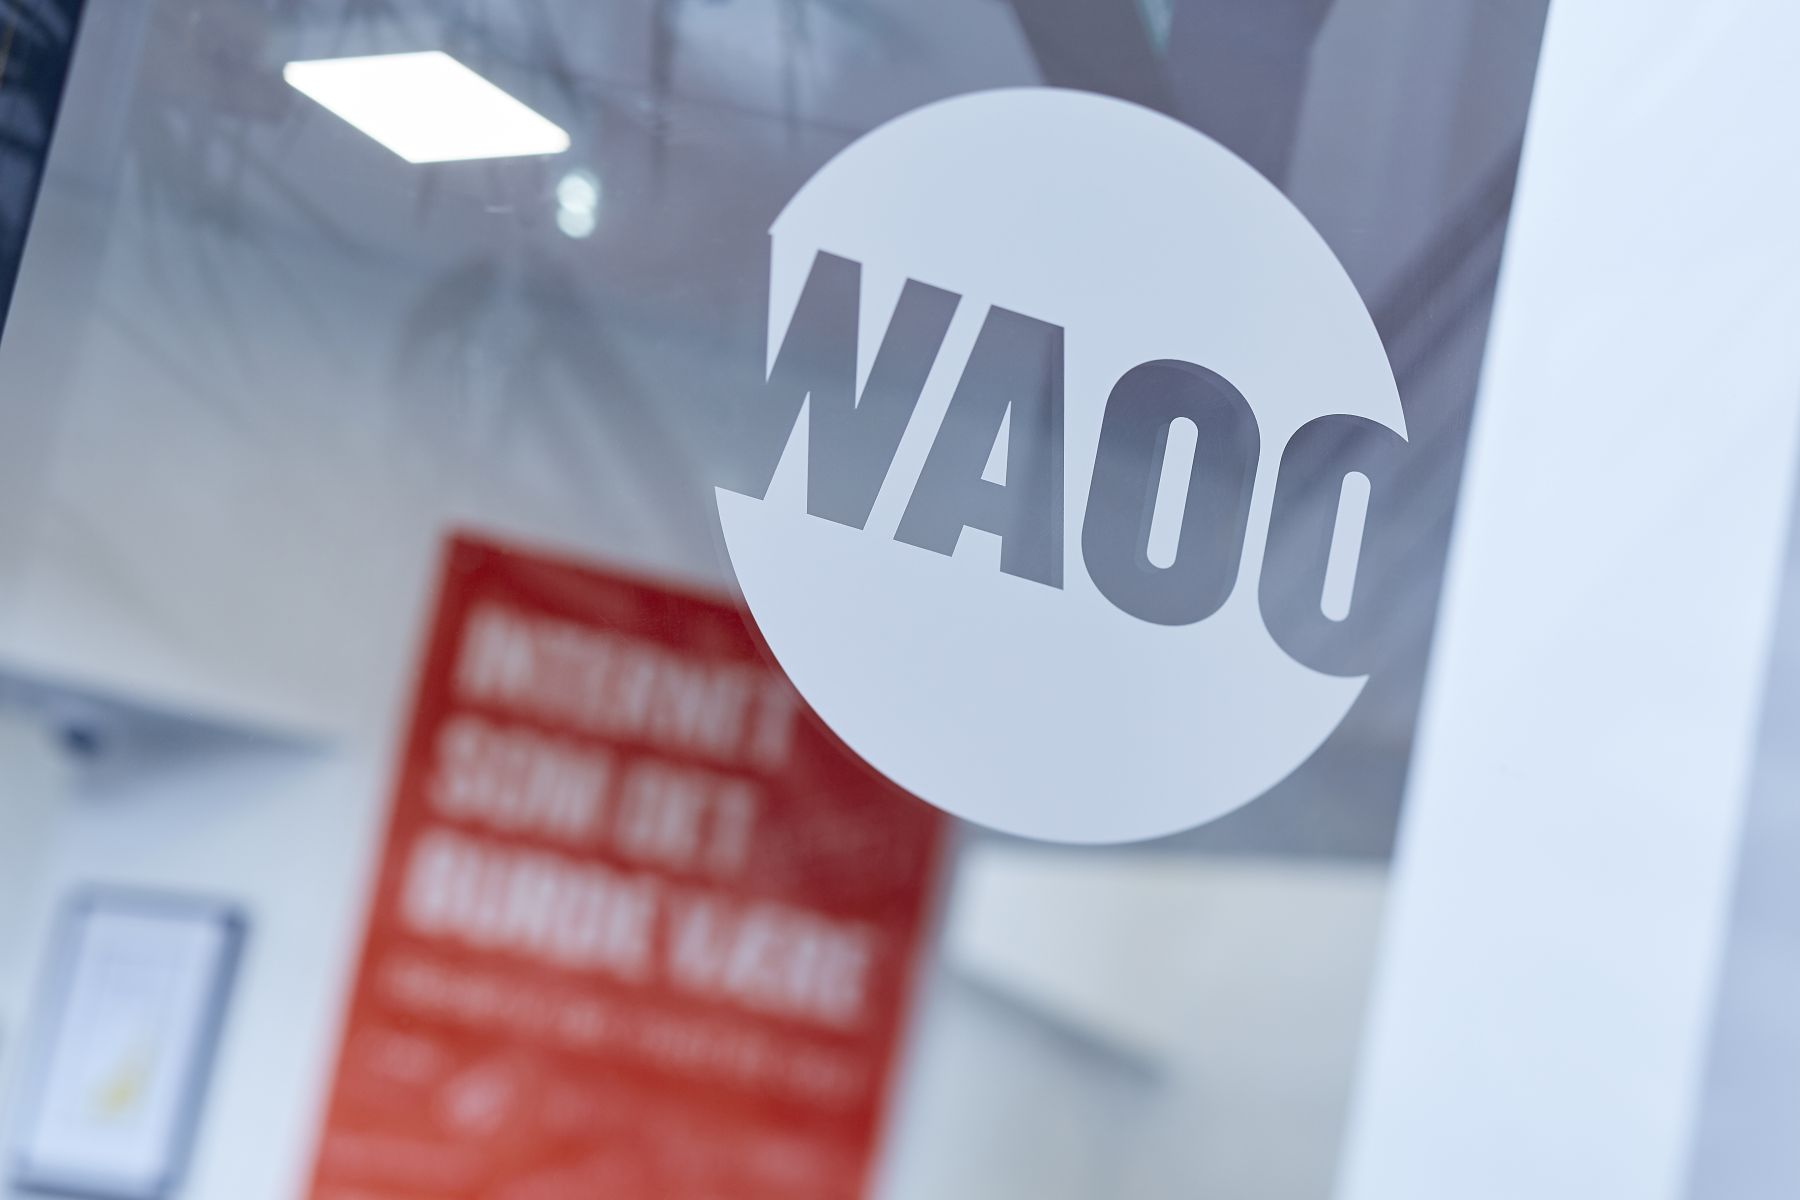 Waoo logo illustration